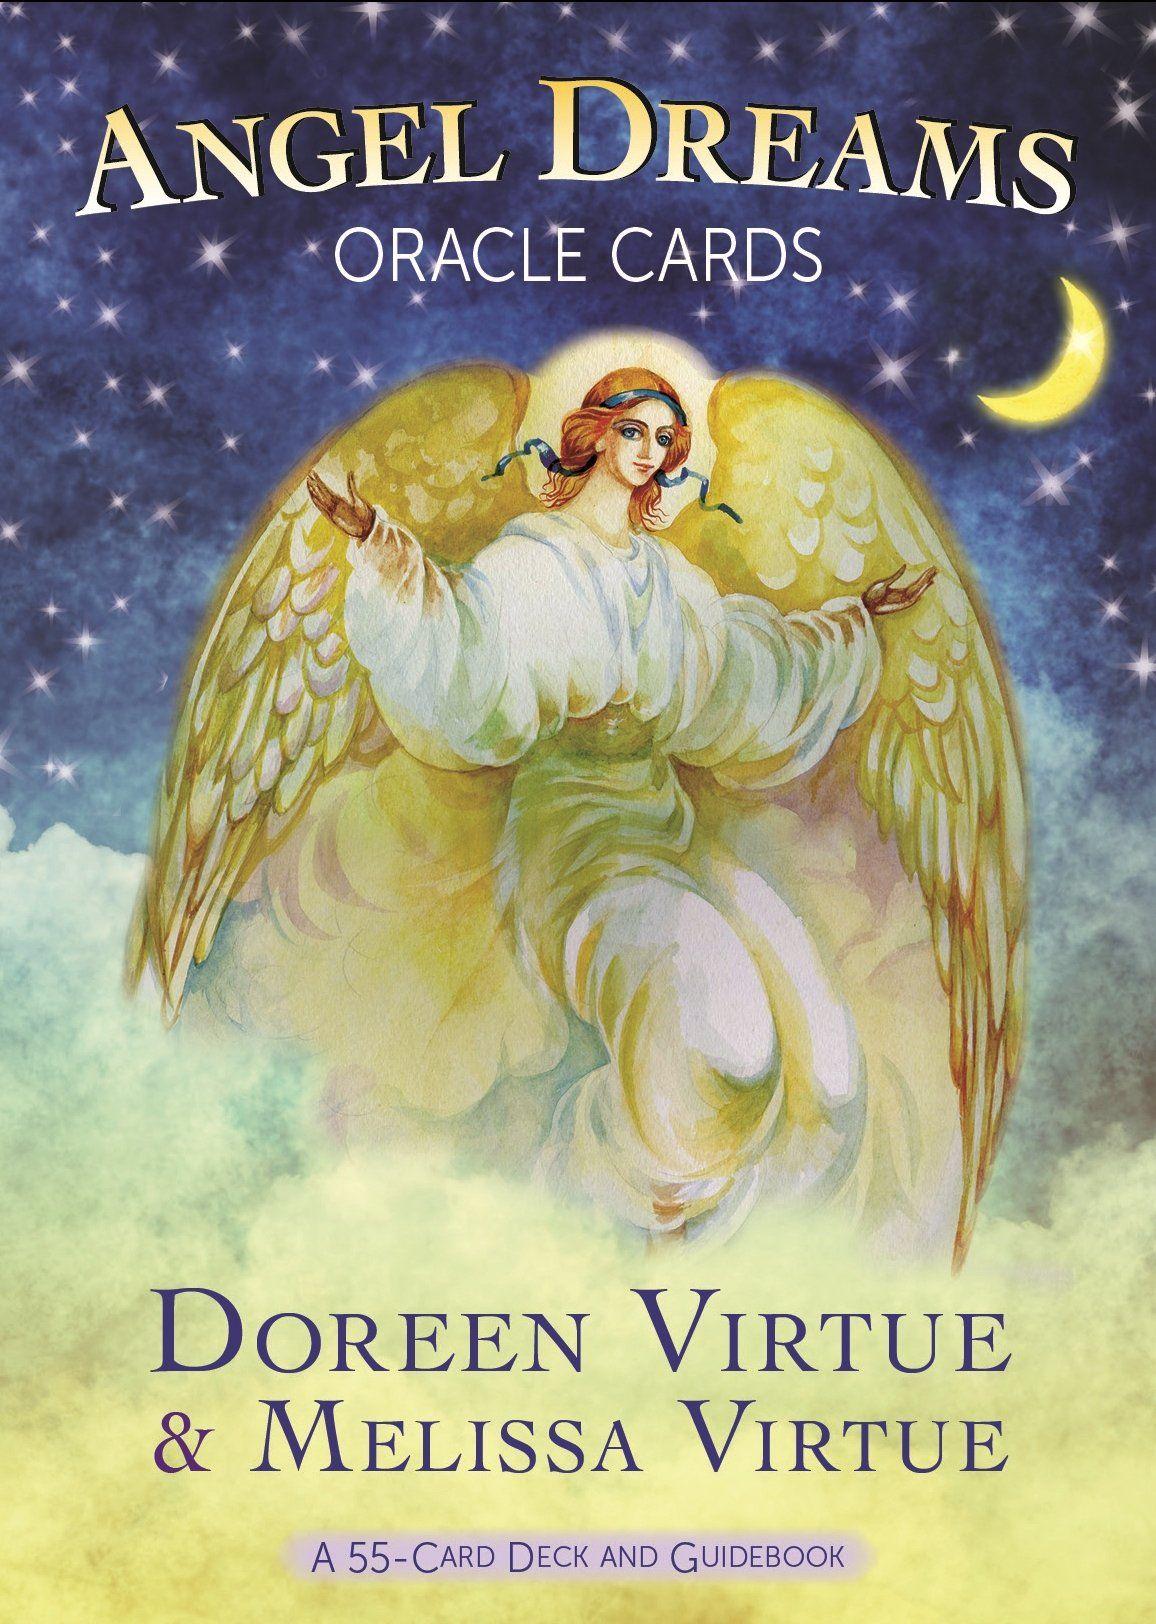 Angel dreams oracle cards doreen virtue melissa virtue